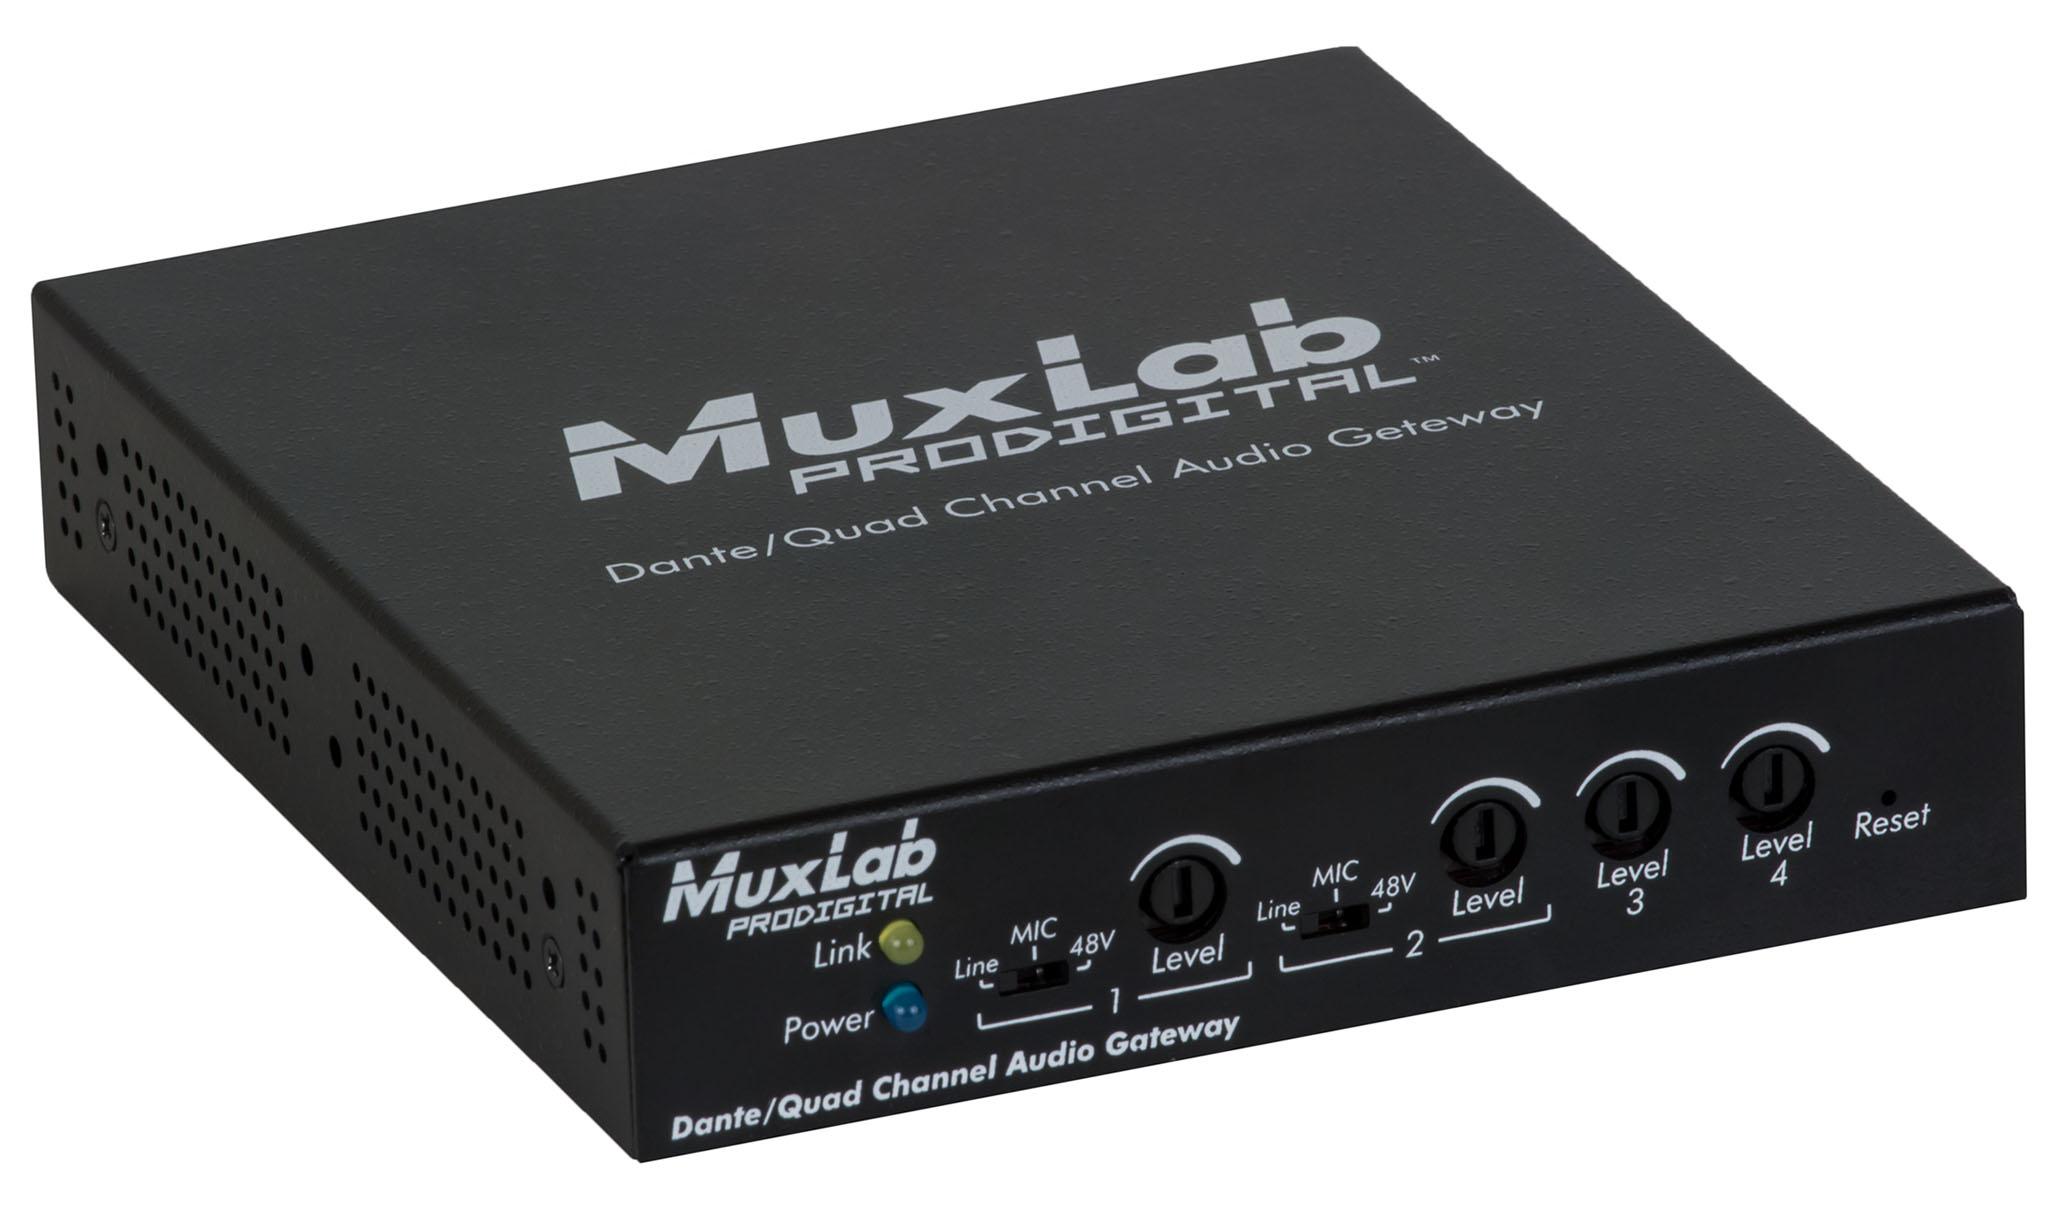 MuxLab(マックスラボ)4入力4出力Danteゲートウェイ 【型番】MUX-DA500765 ※お取り寄せ